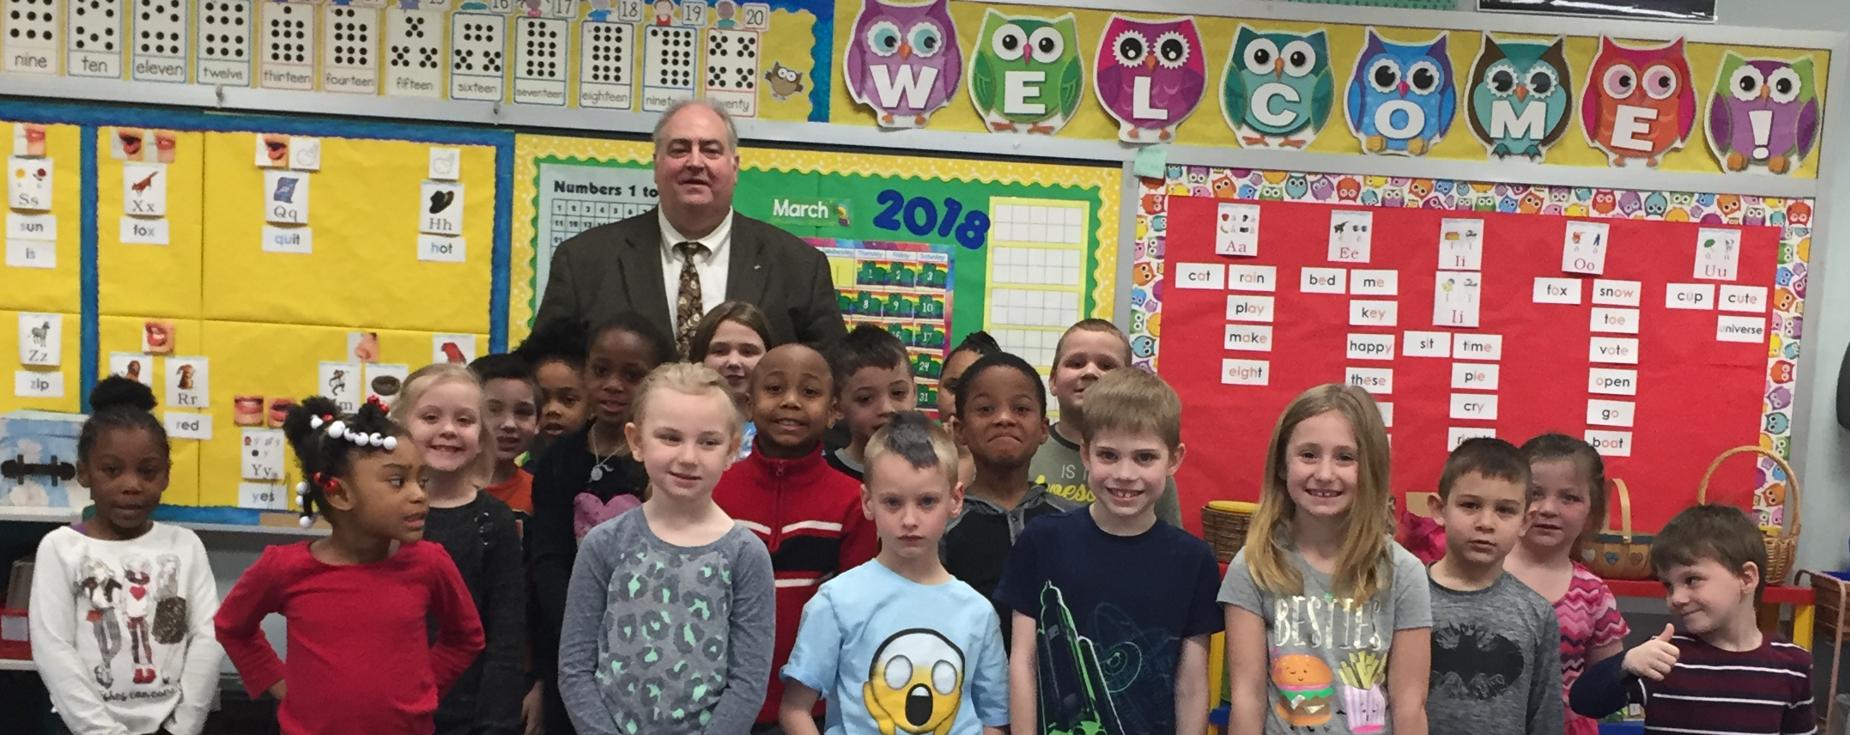 Superintendent, John Pallone with 1st grade class